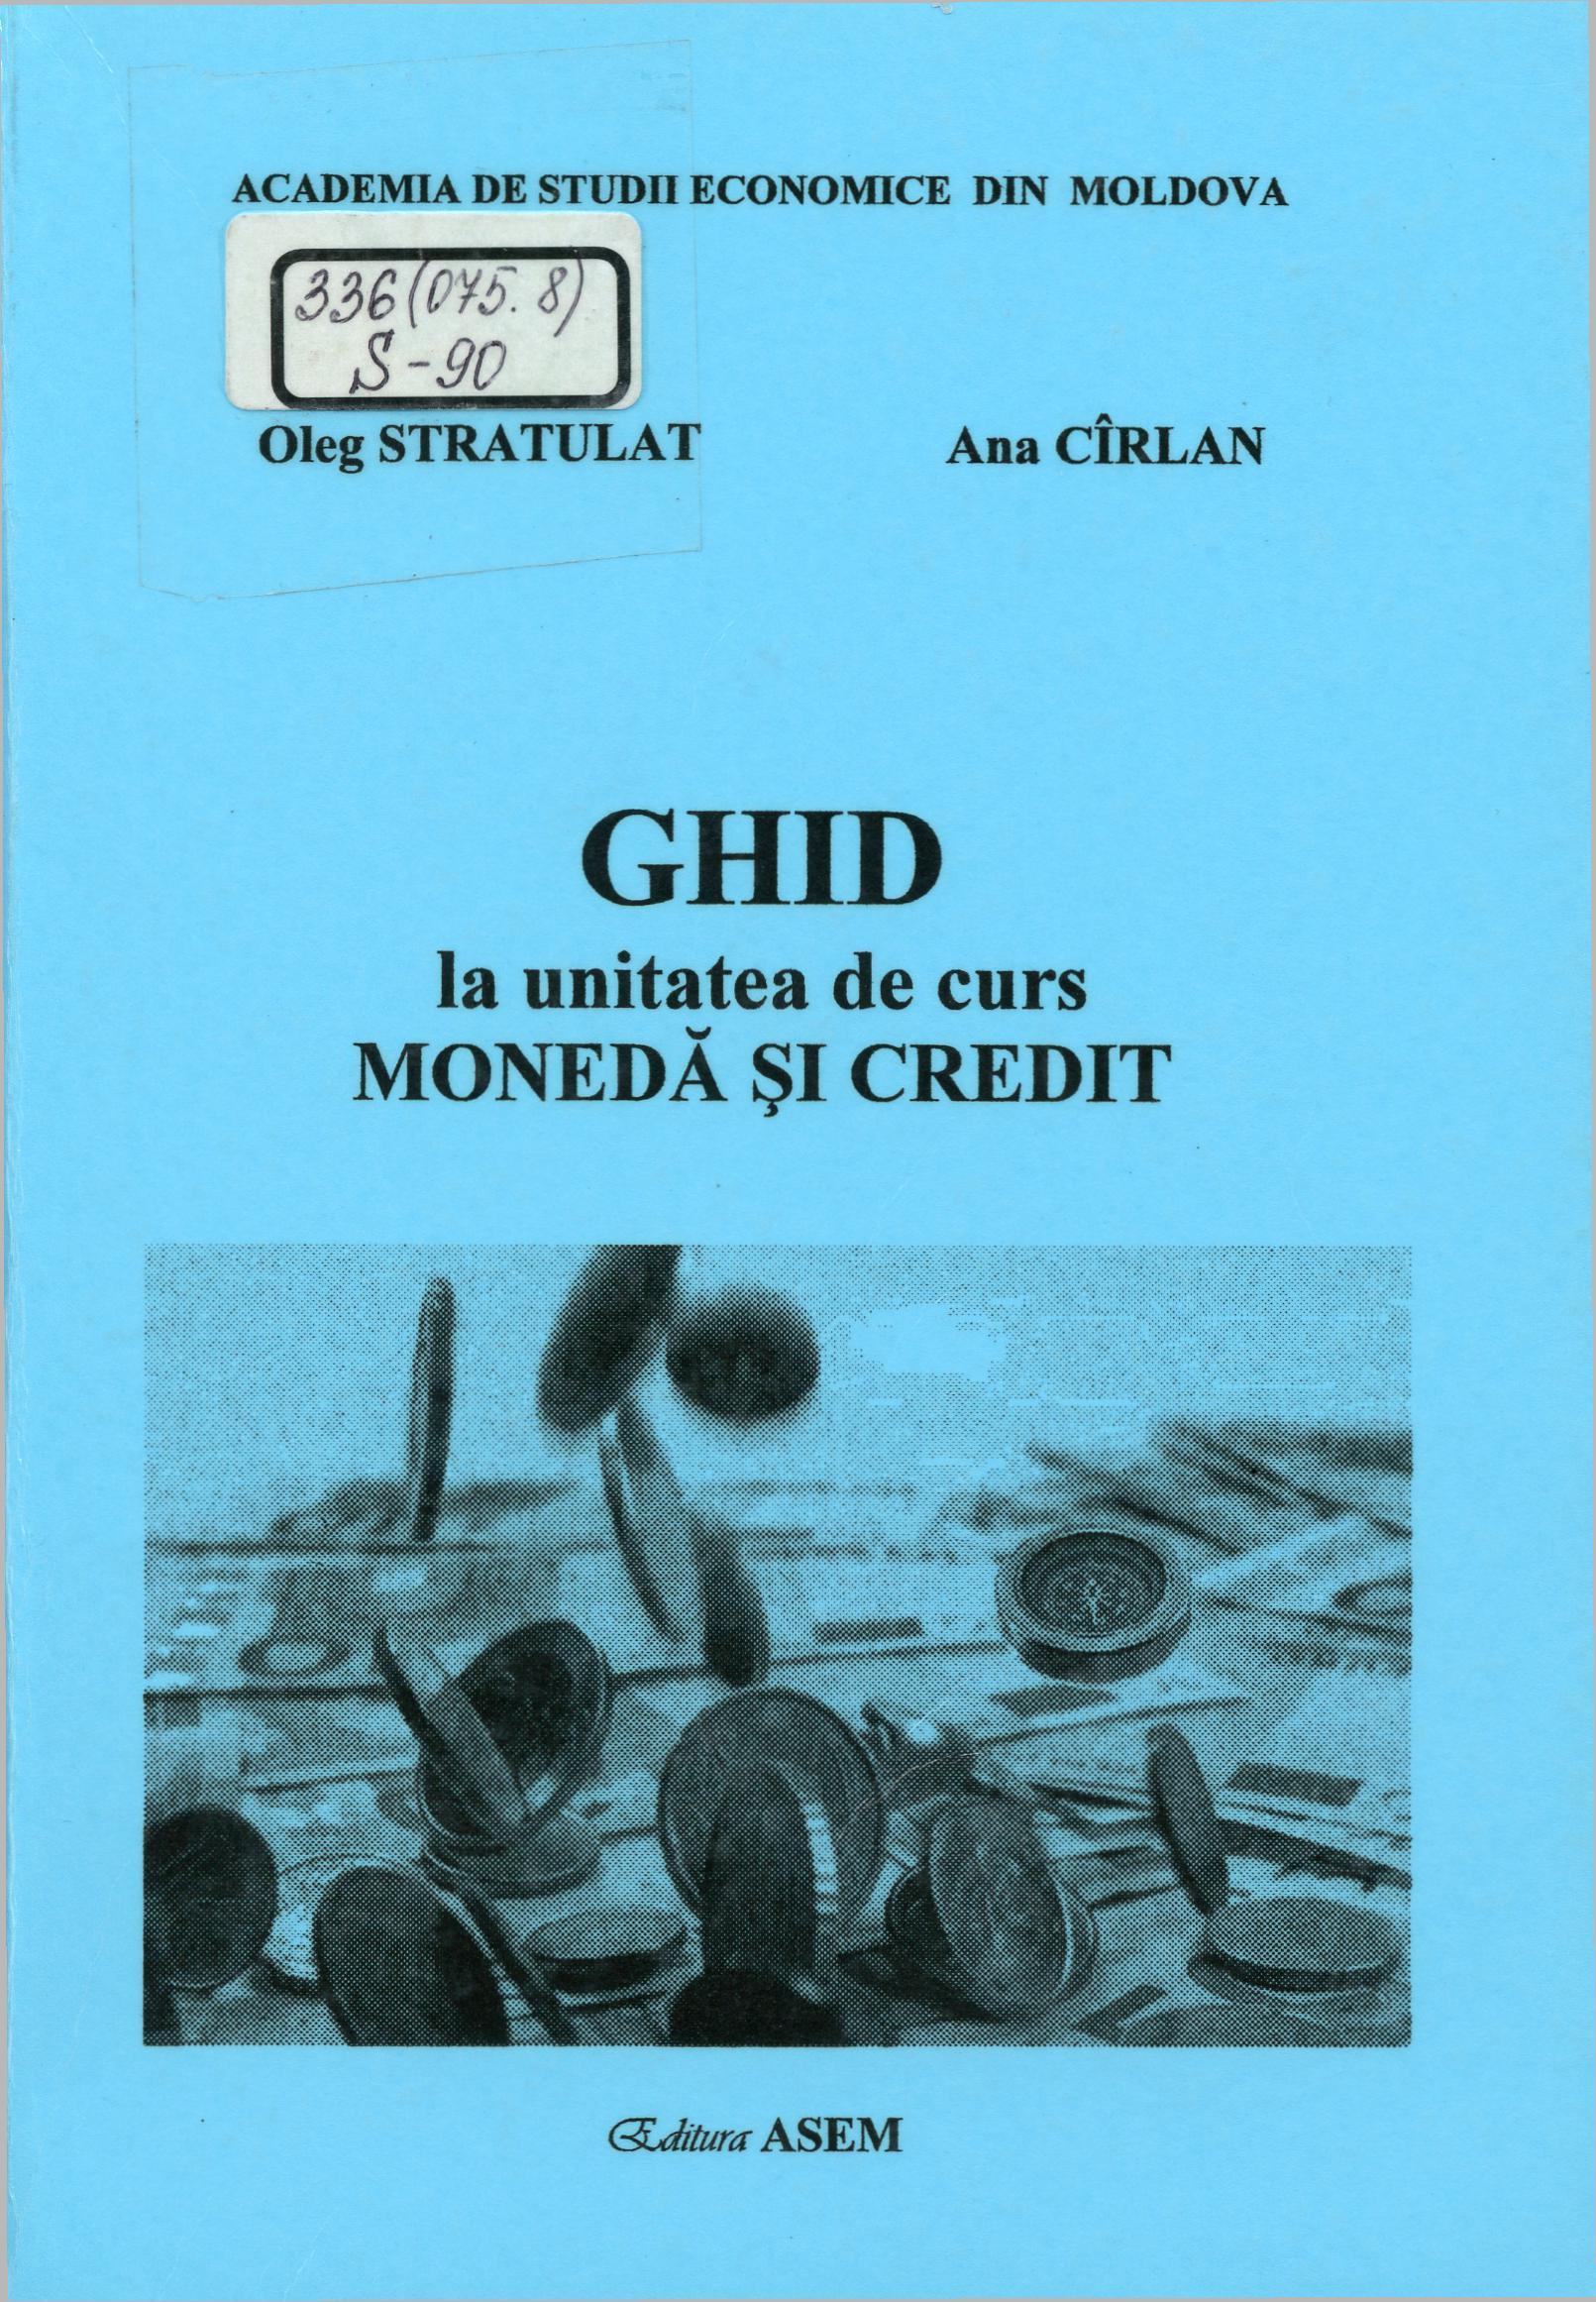 Ghid la unitatea de curs Moneda și credit